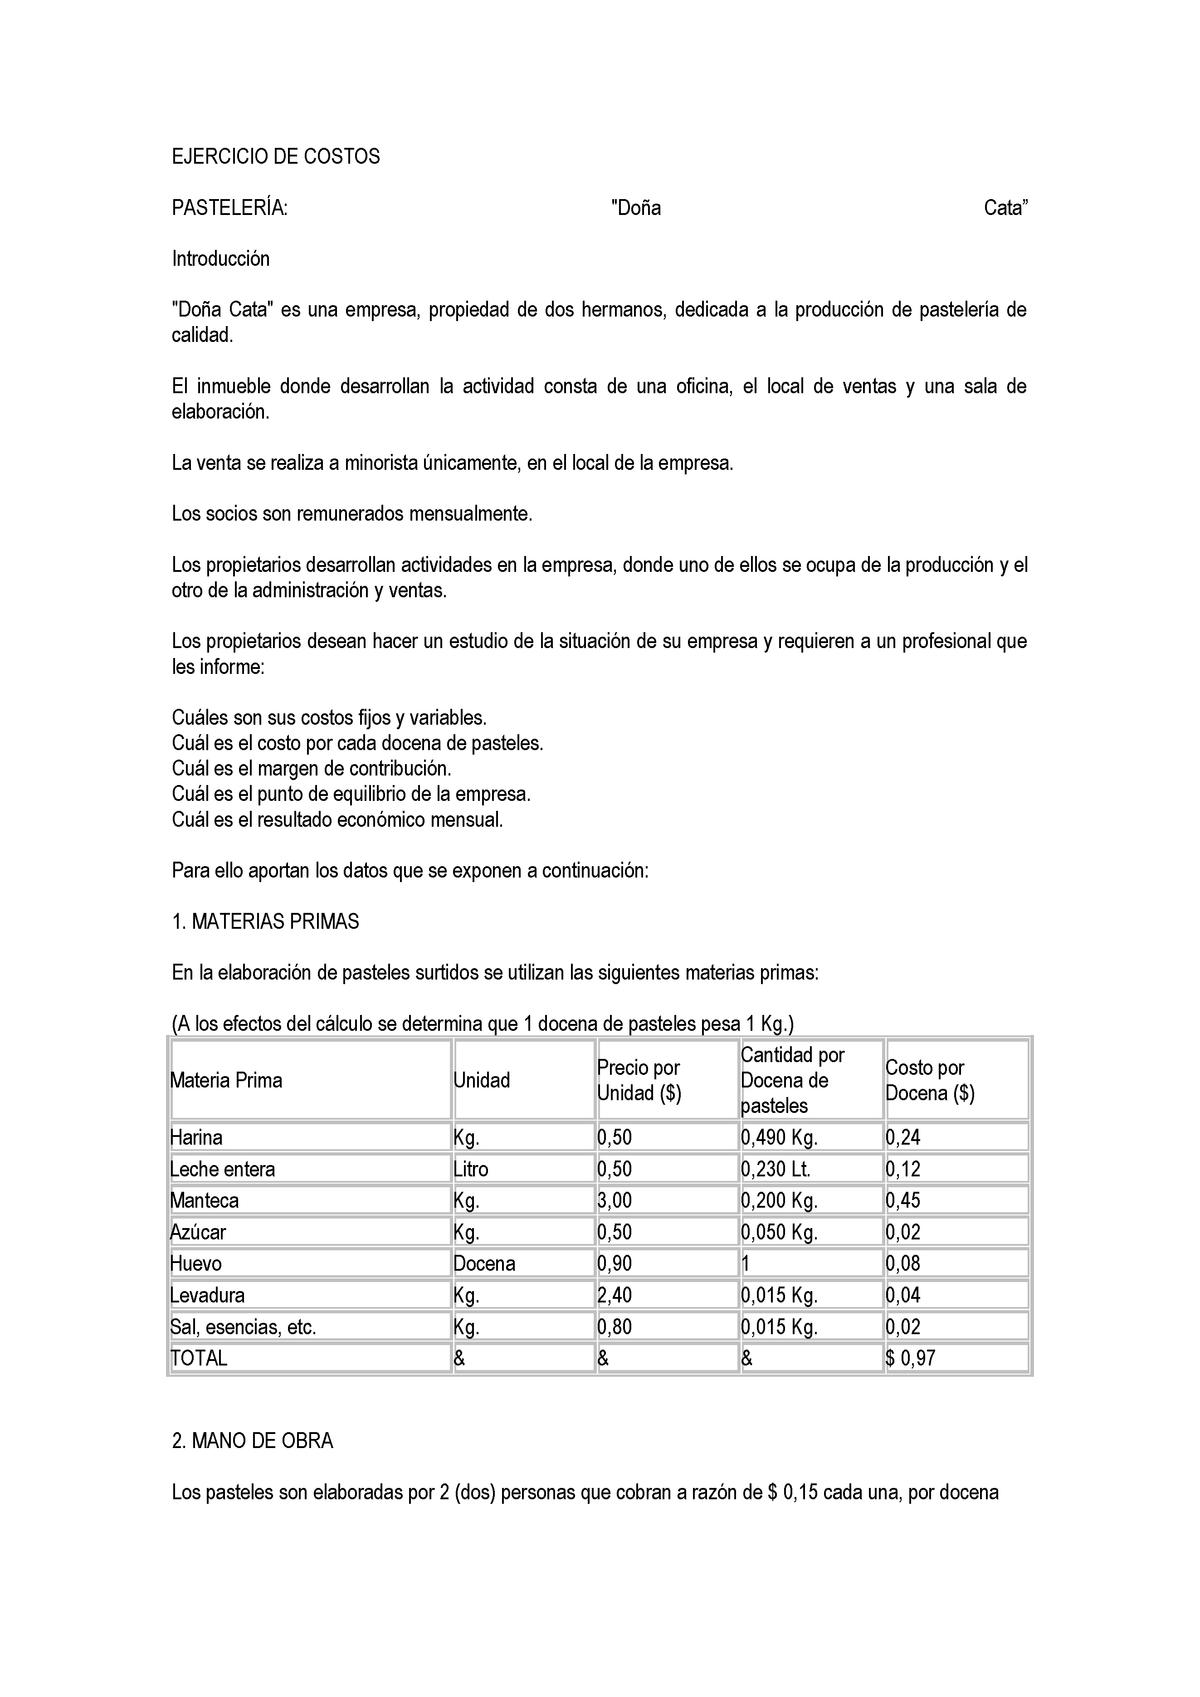 Ejemplo De Costos 2 21853 Upf Studocu